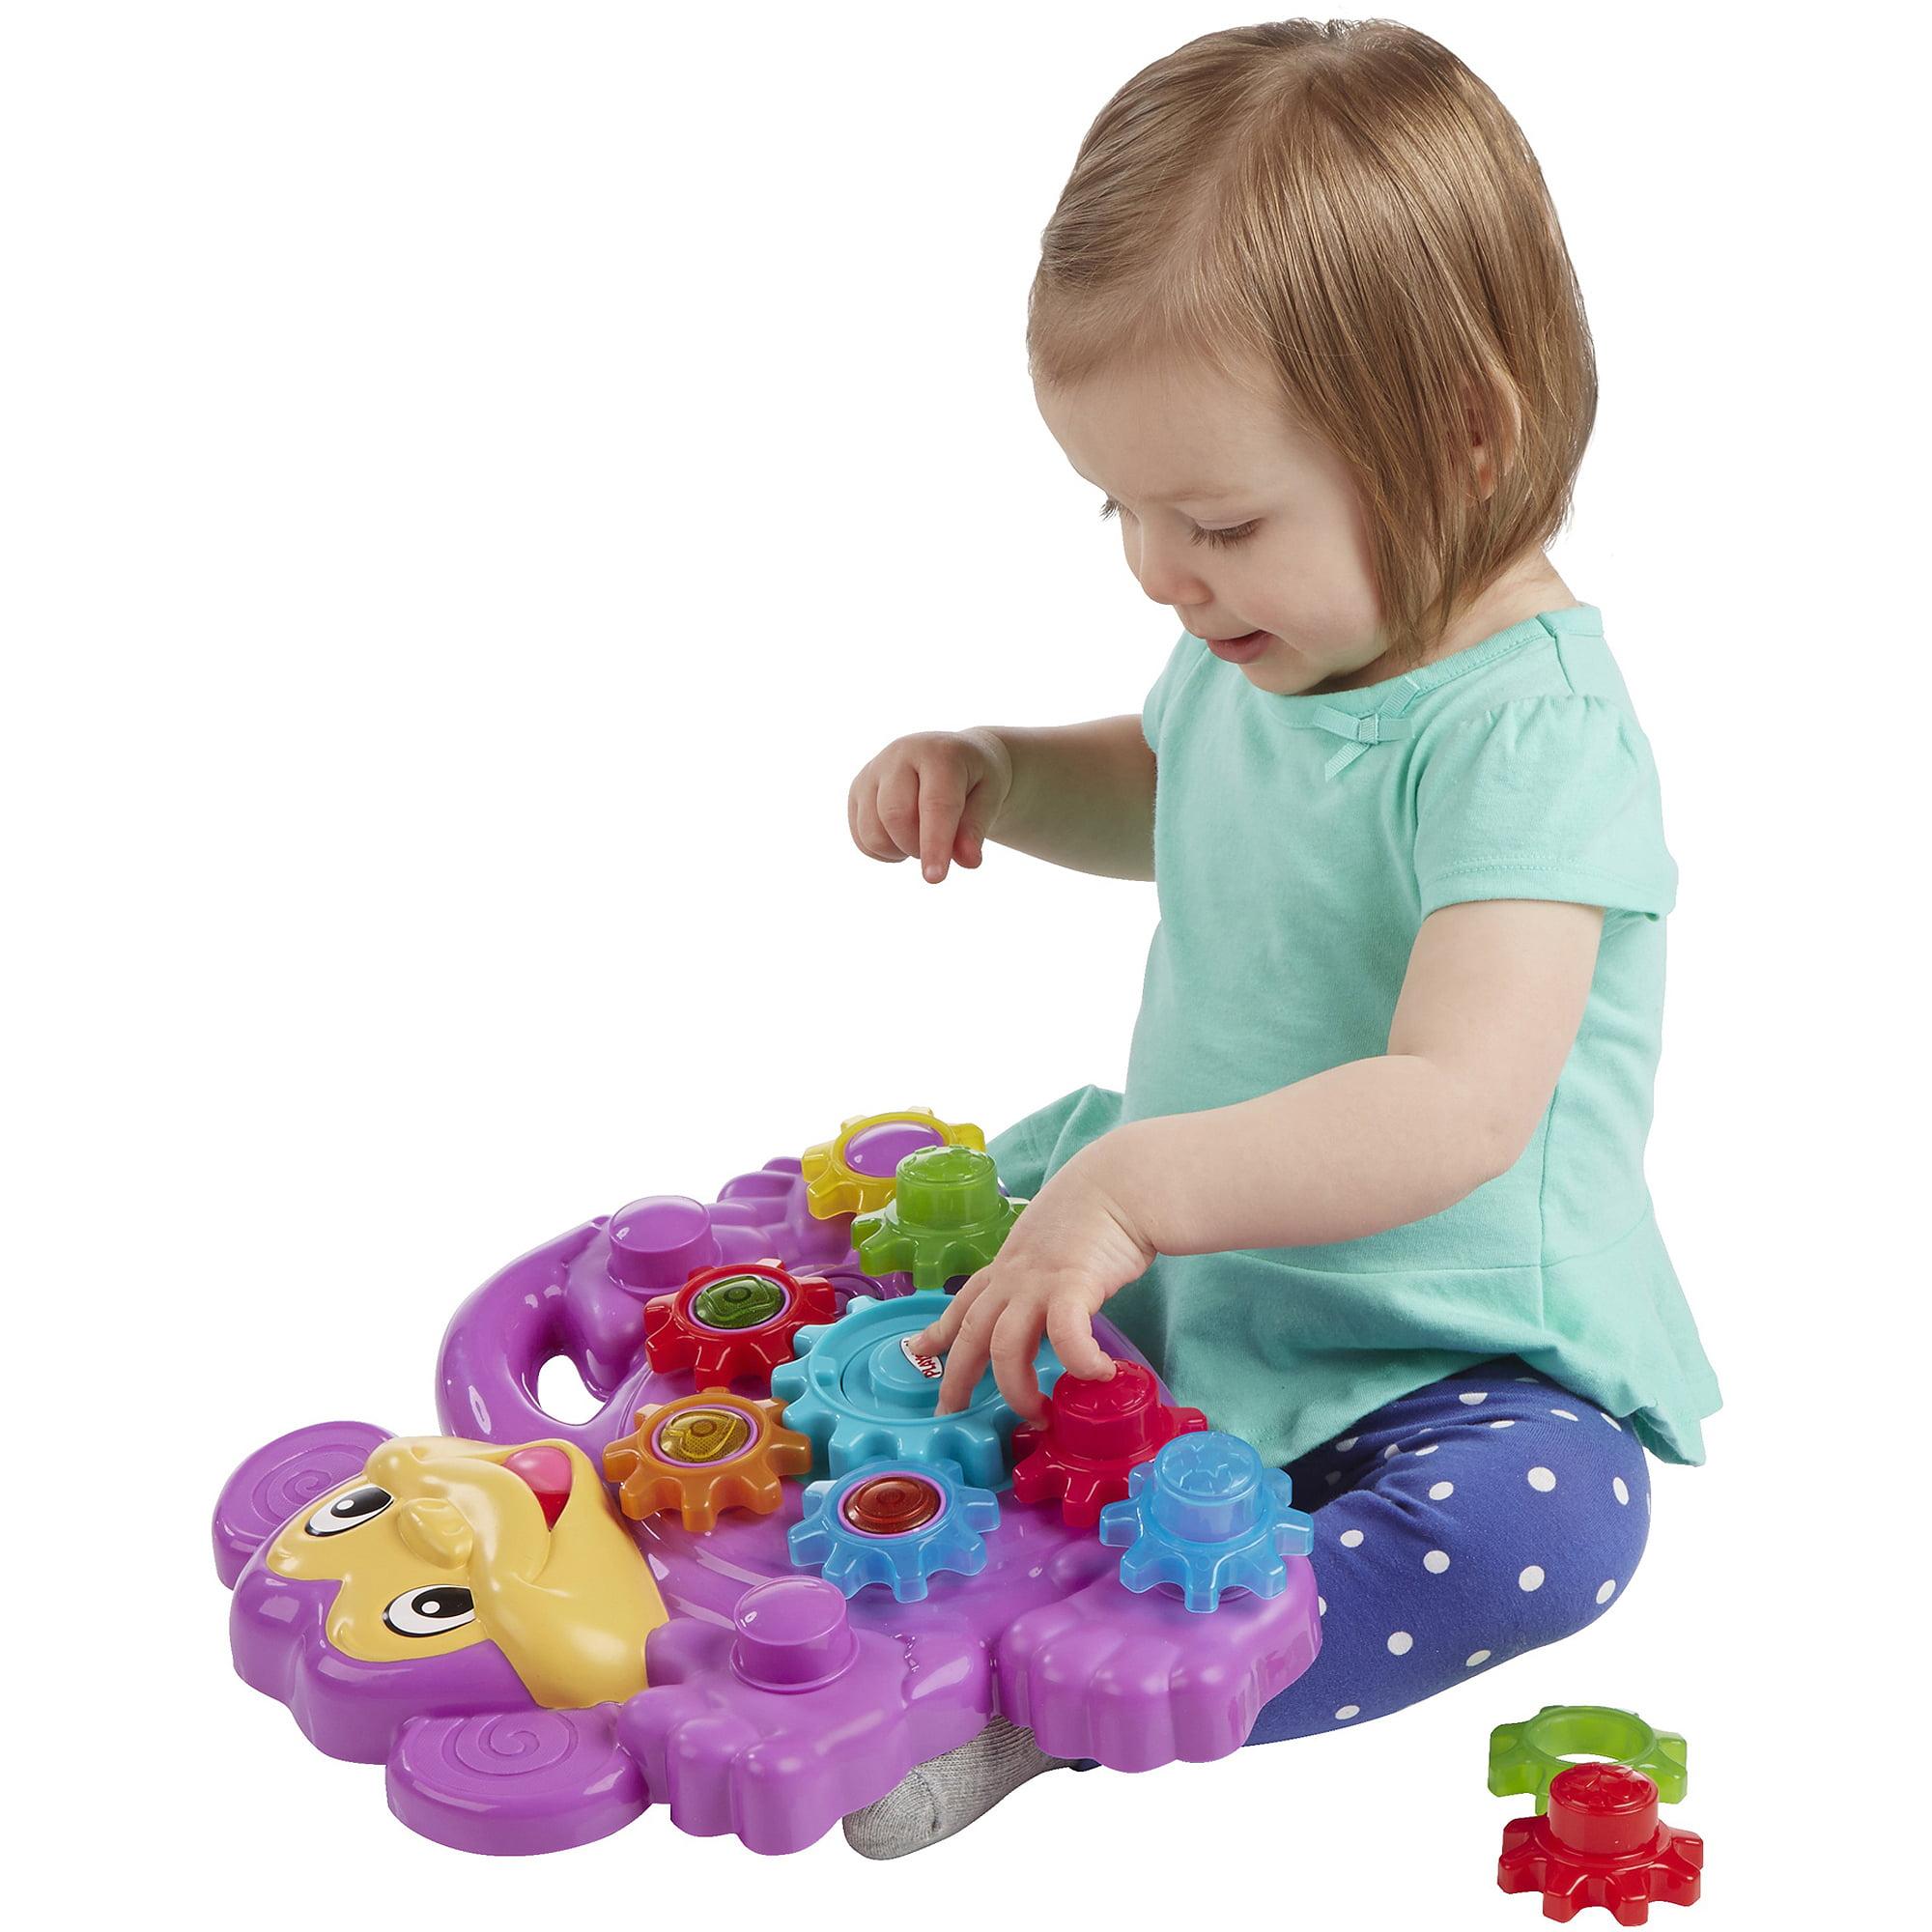 Playskool Stack \'n Spin Monkey Gears Toy - Walmart.com